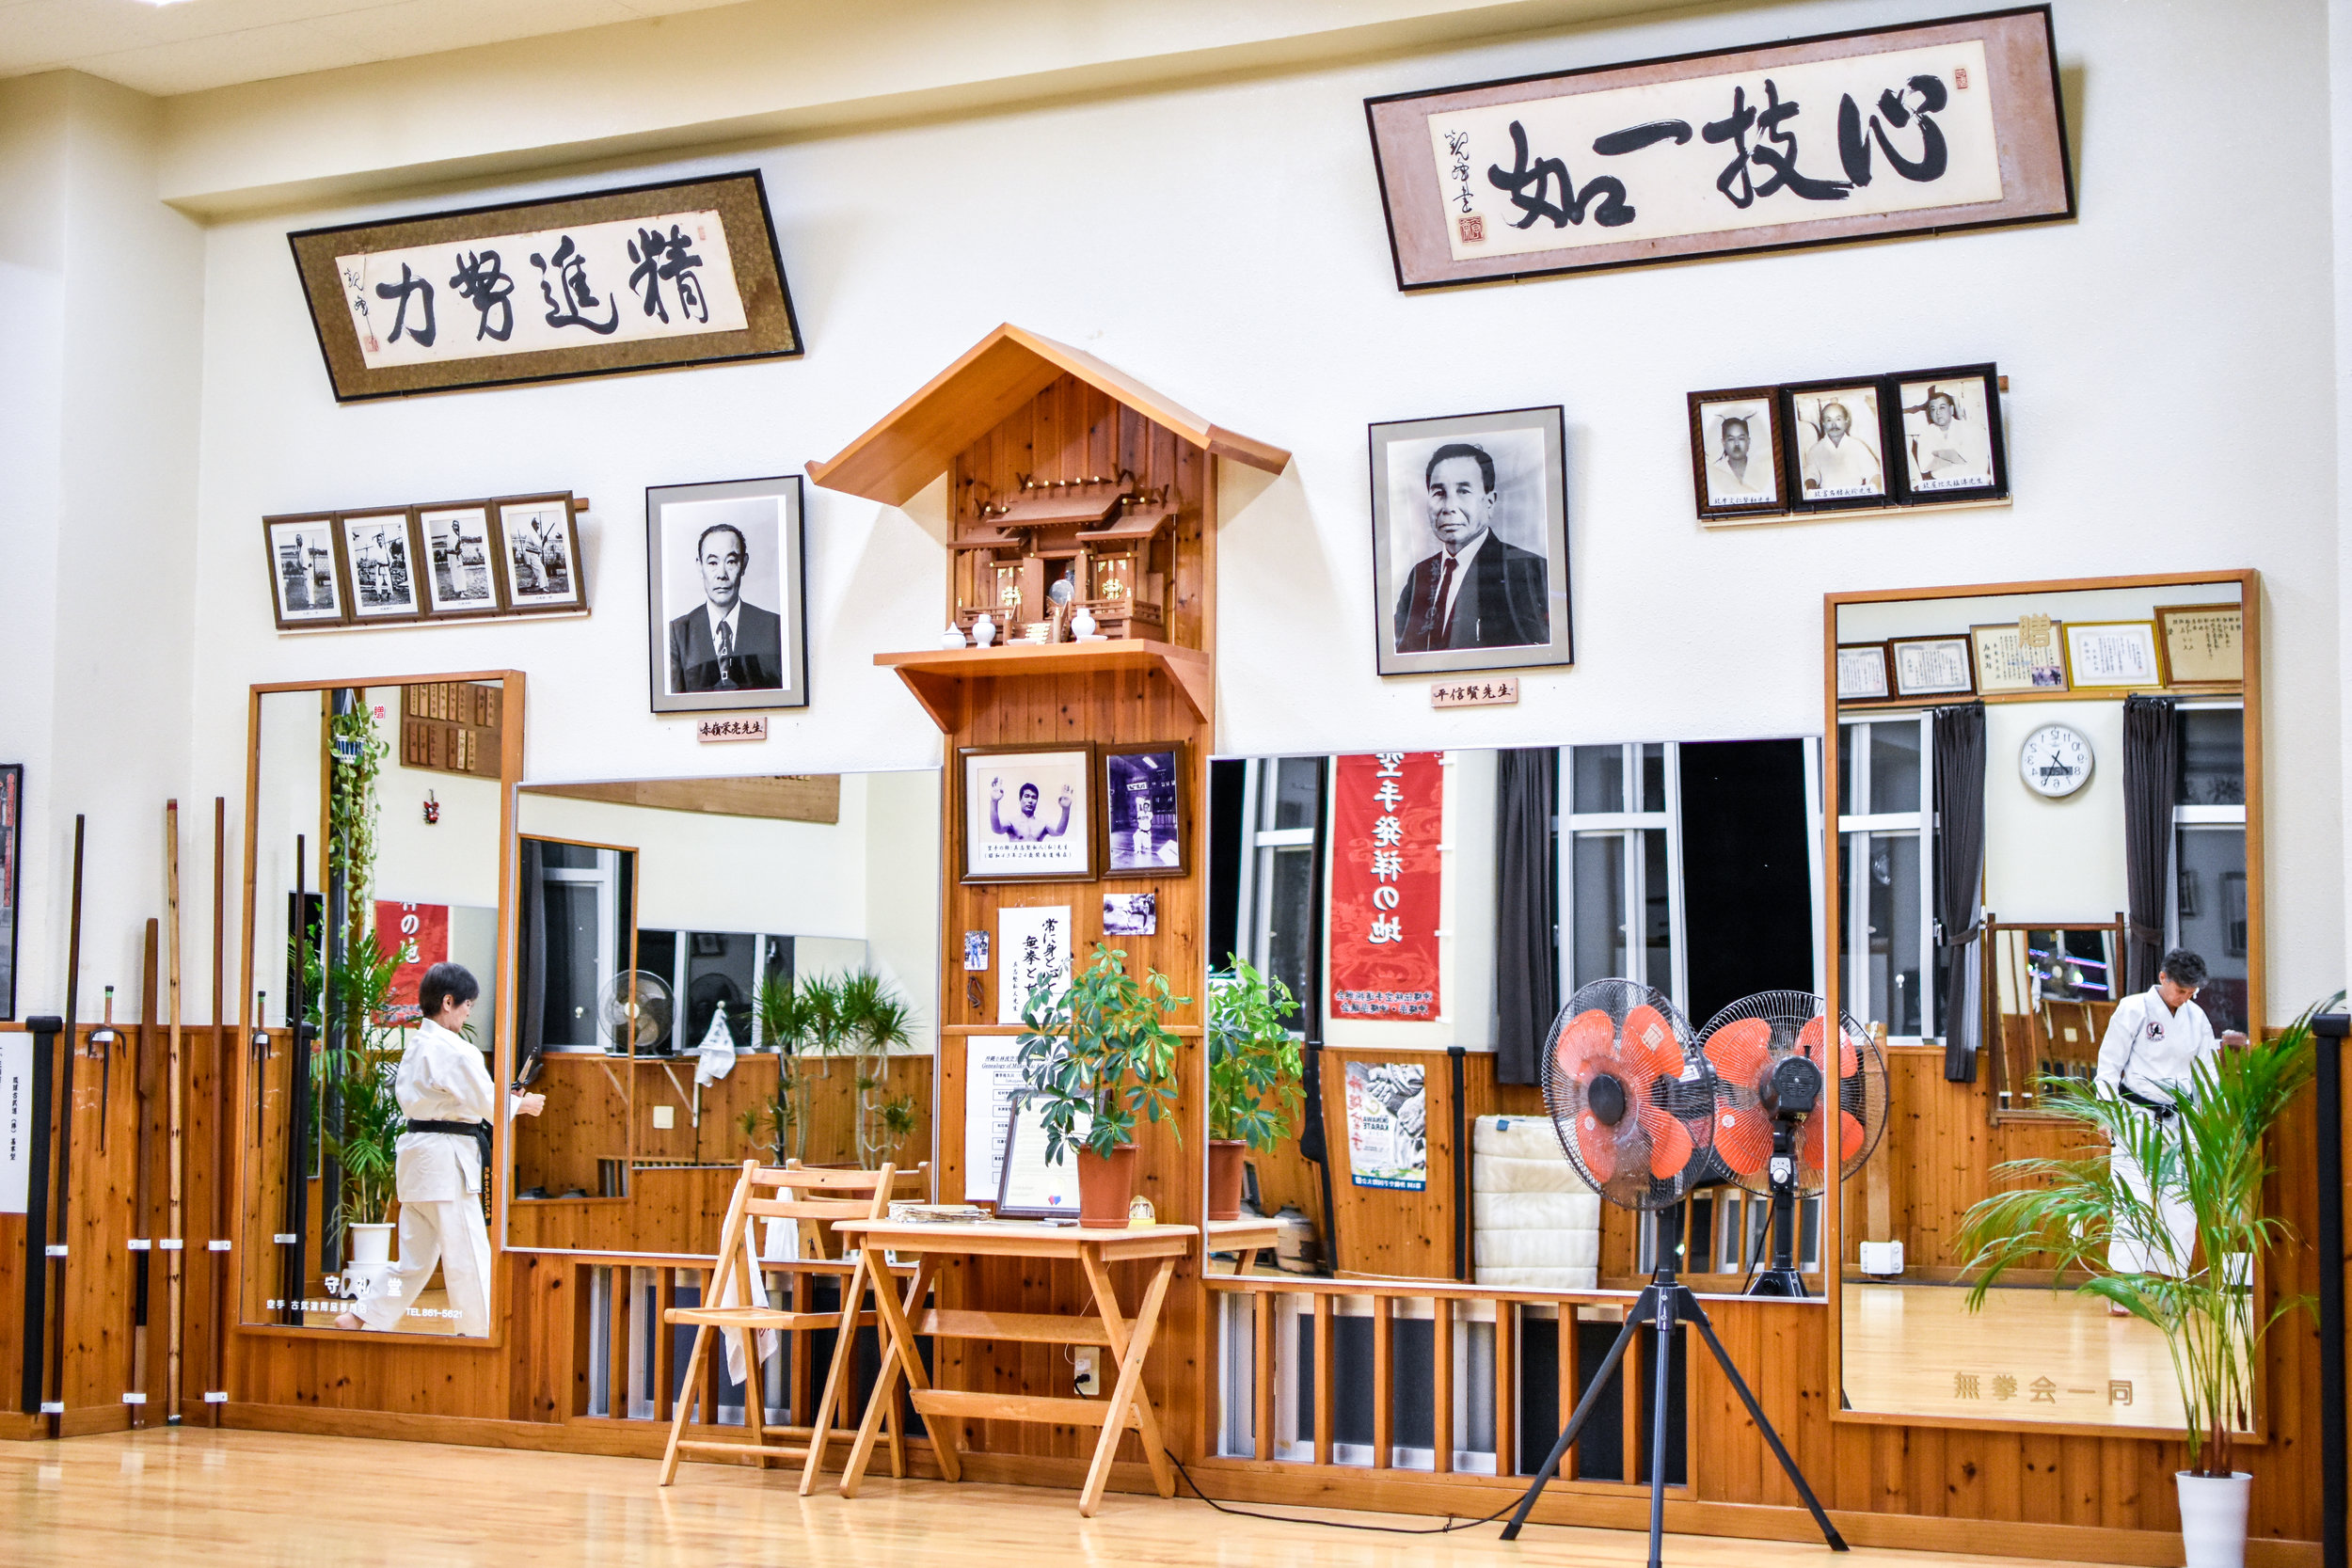 The Shomen of the Shimbukan Hombu Dojo, pictures of Taira Shinken (right) and Eisuke Akamine (Left).